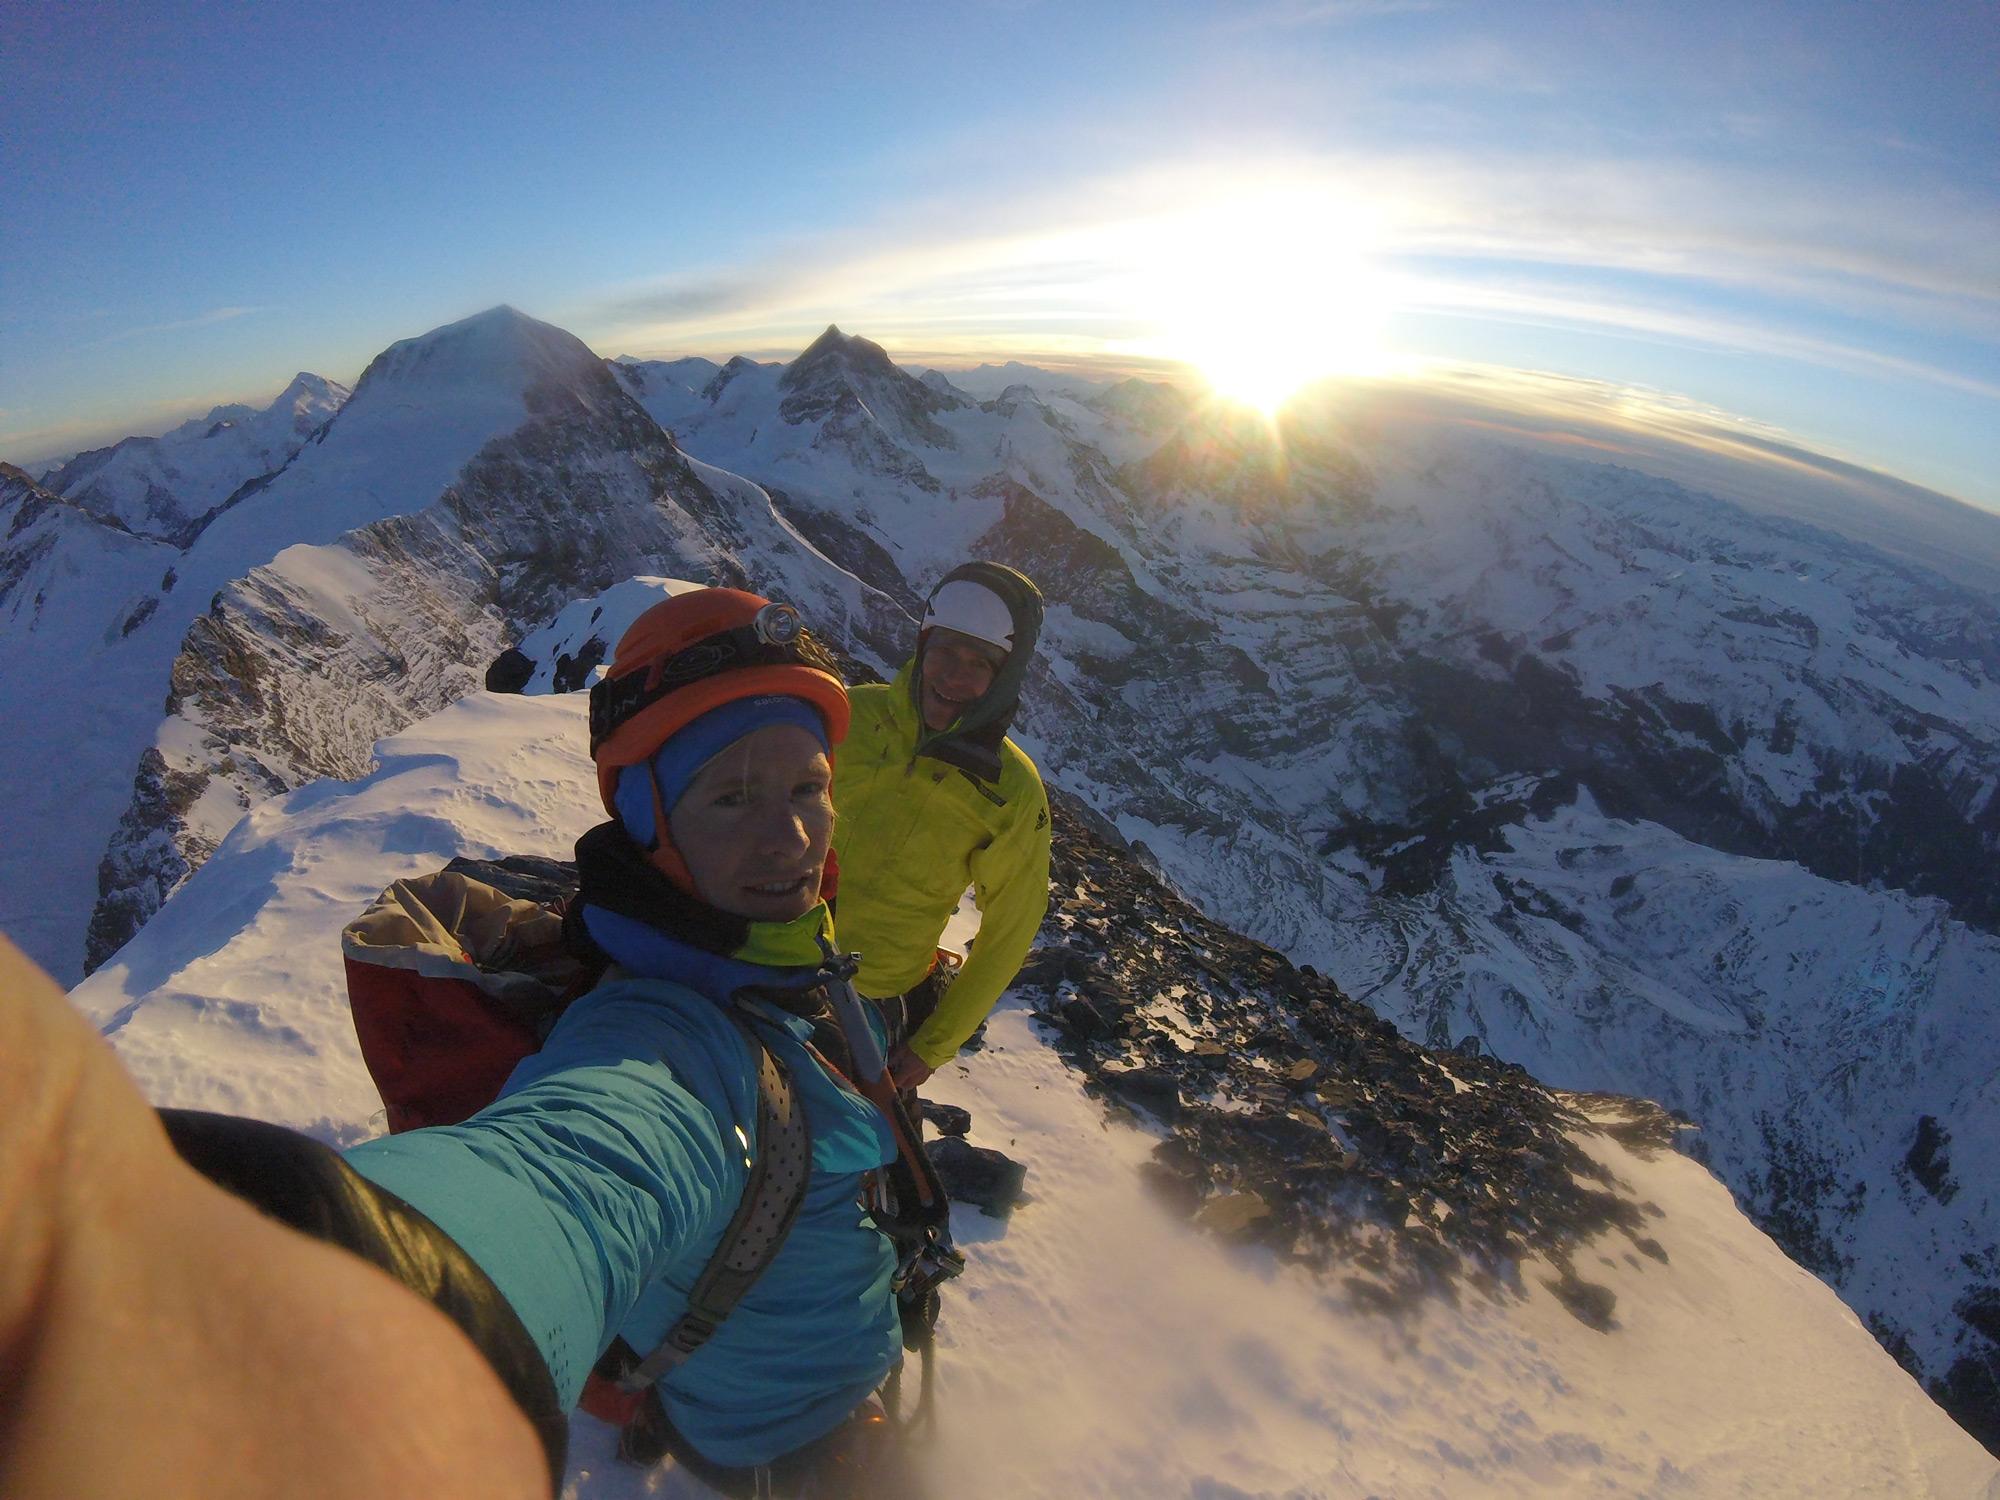 Simon Messner, Eiger Nordwand Nordpfeiler I bergundsteigen.blog